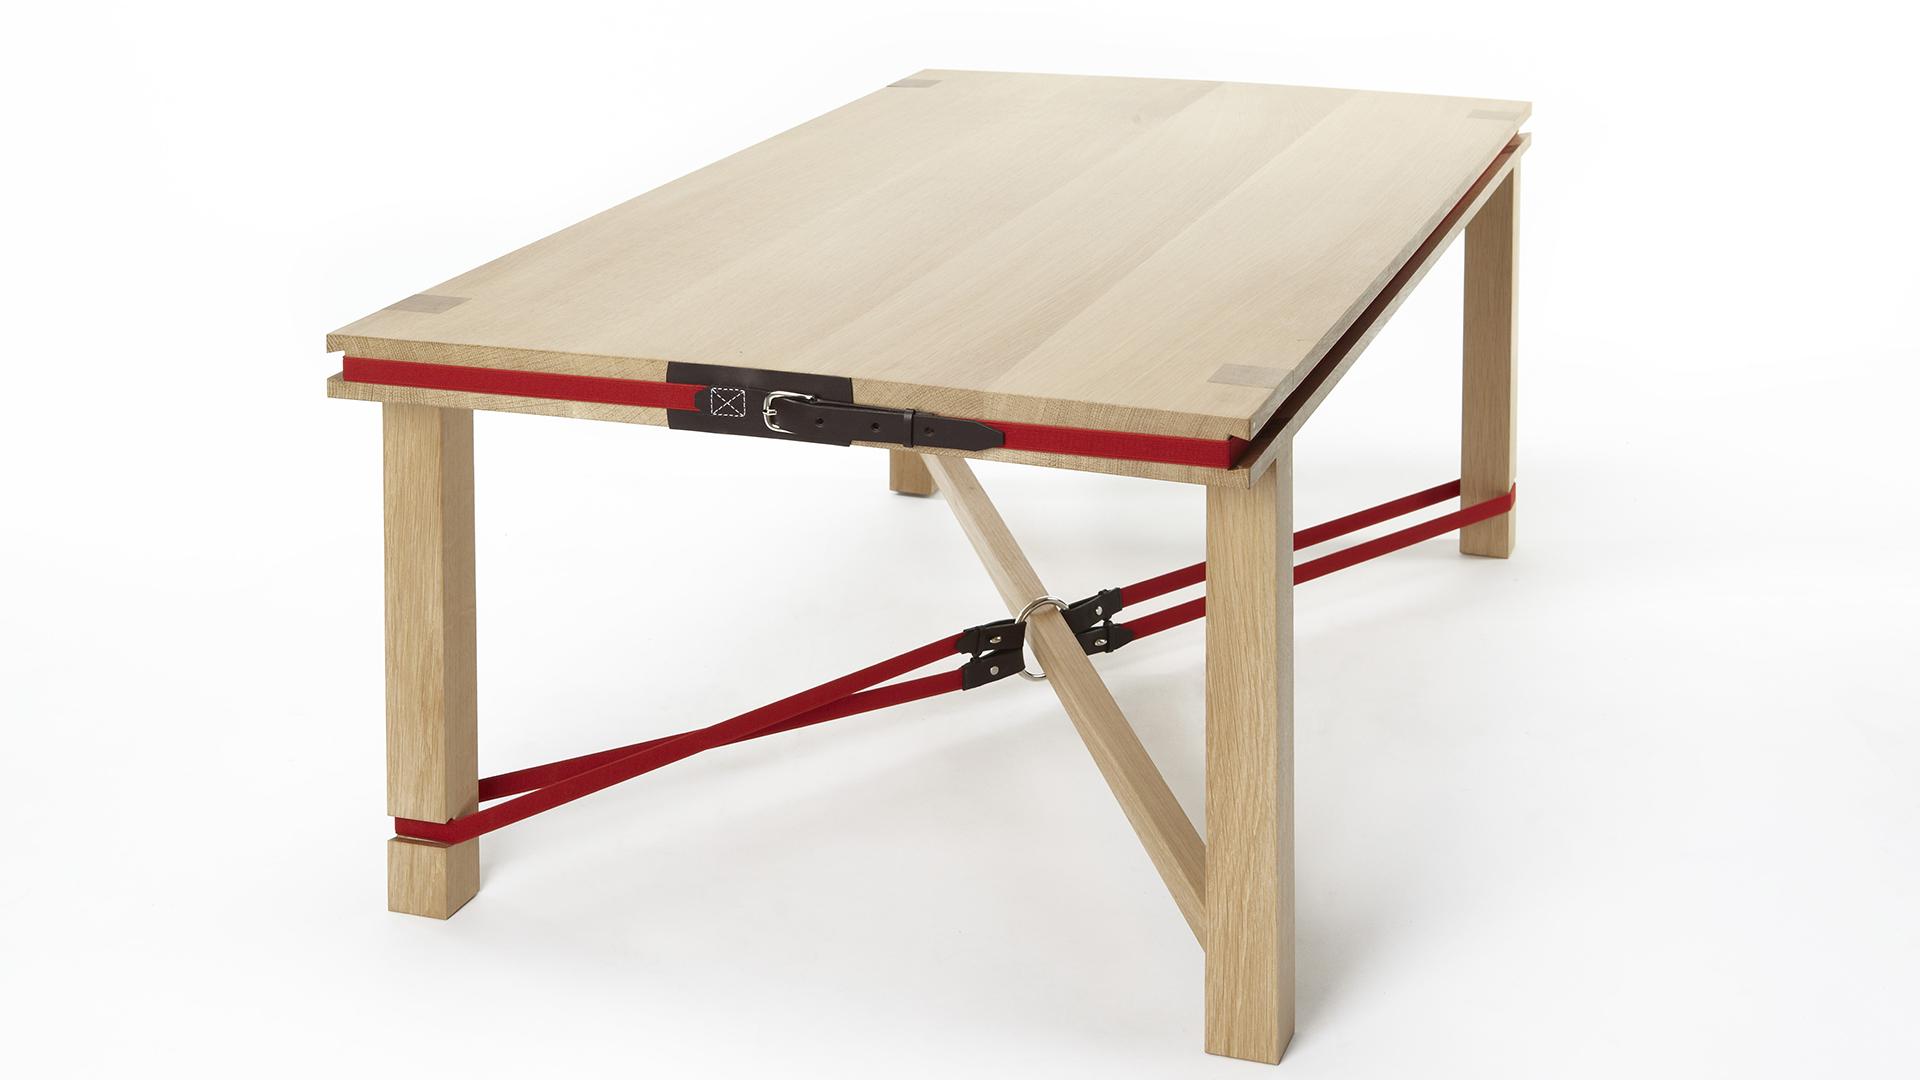 cazin_singularite_riding_table_basse_2